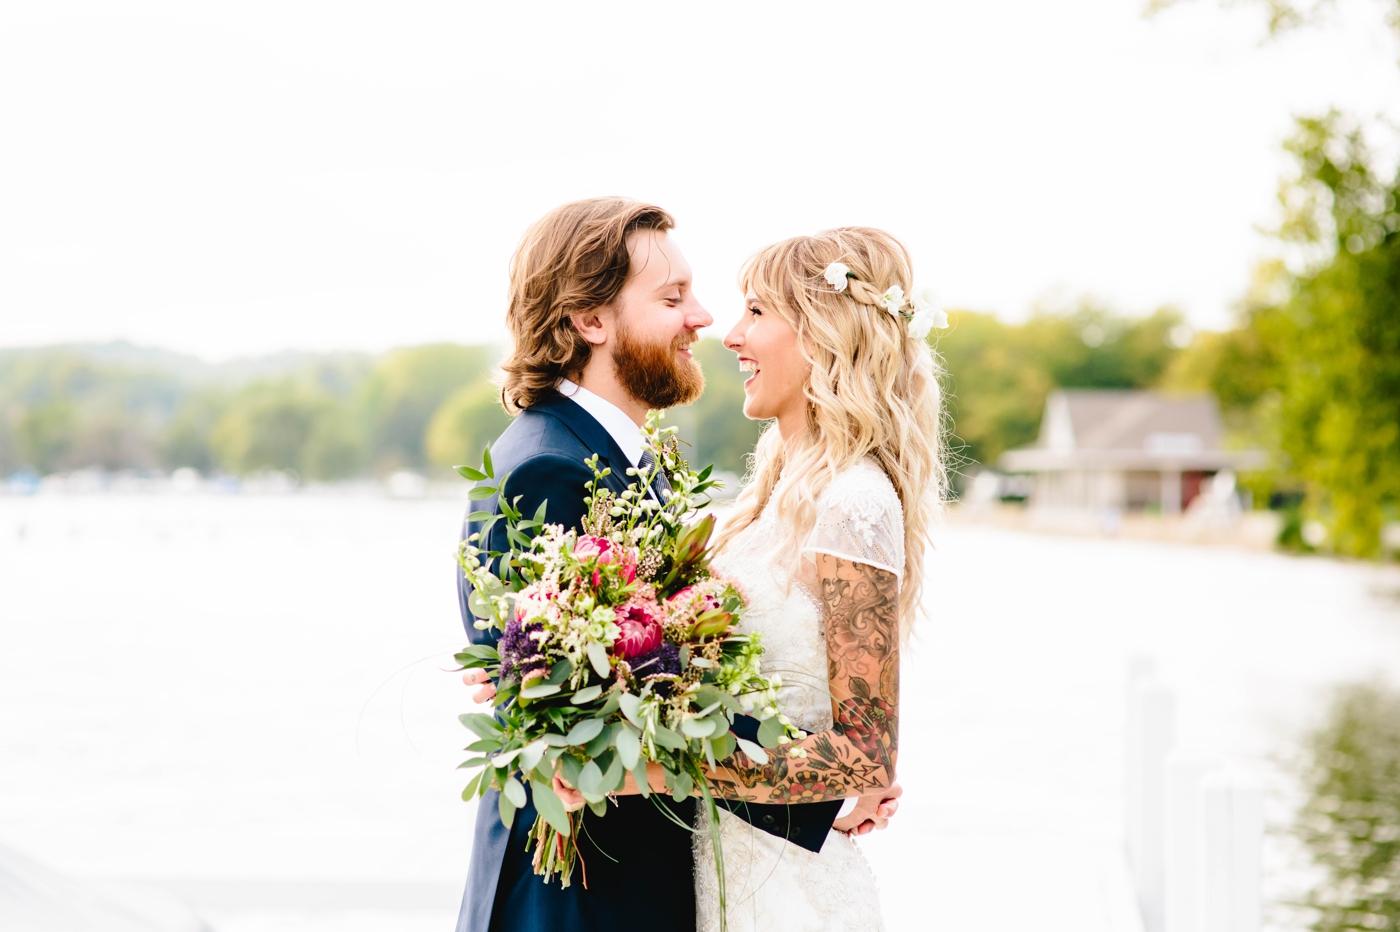 chicago-fine-art-wedding-photography-chriskelsey24